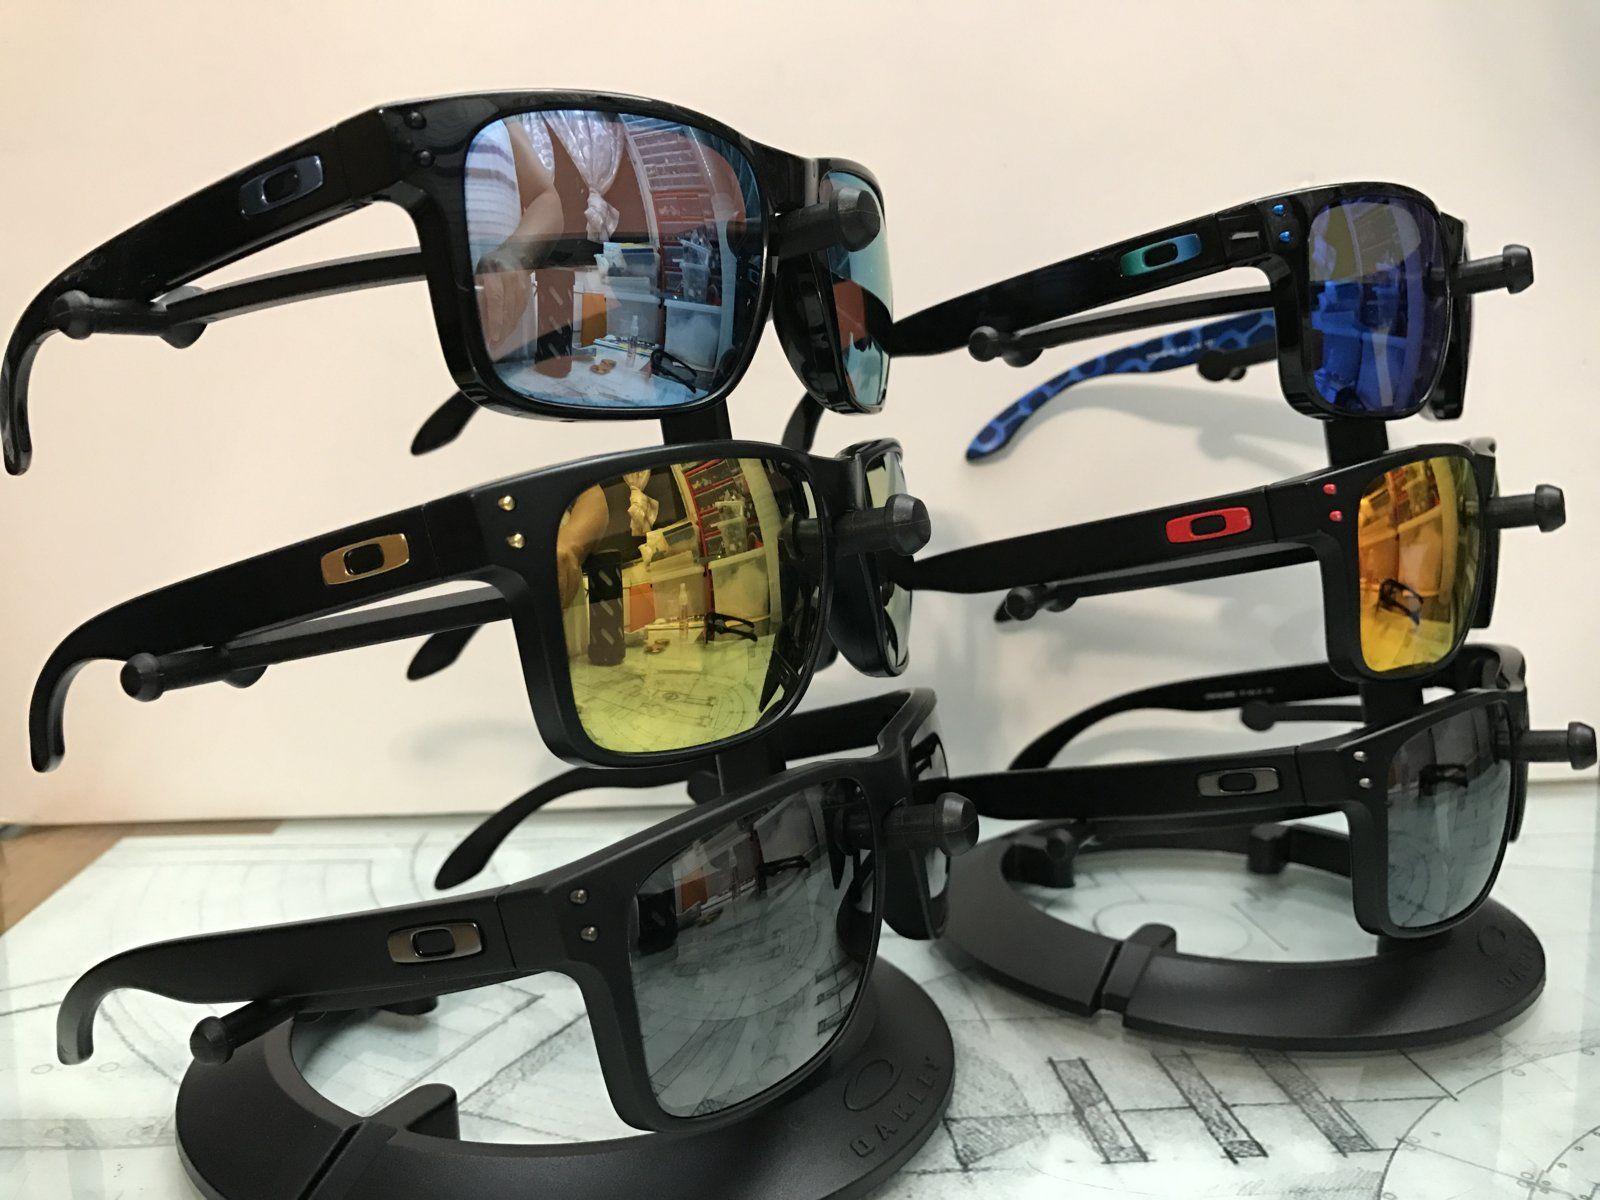 how to change lenses inoakley-radar-sunglasses-09-670-136